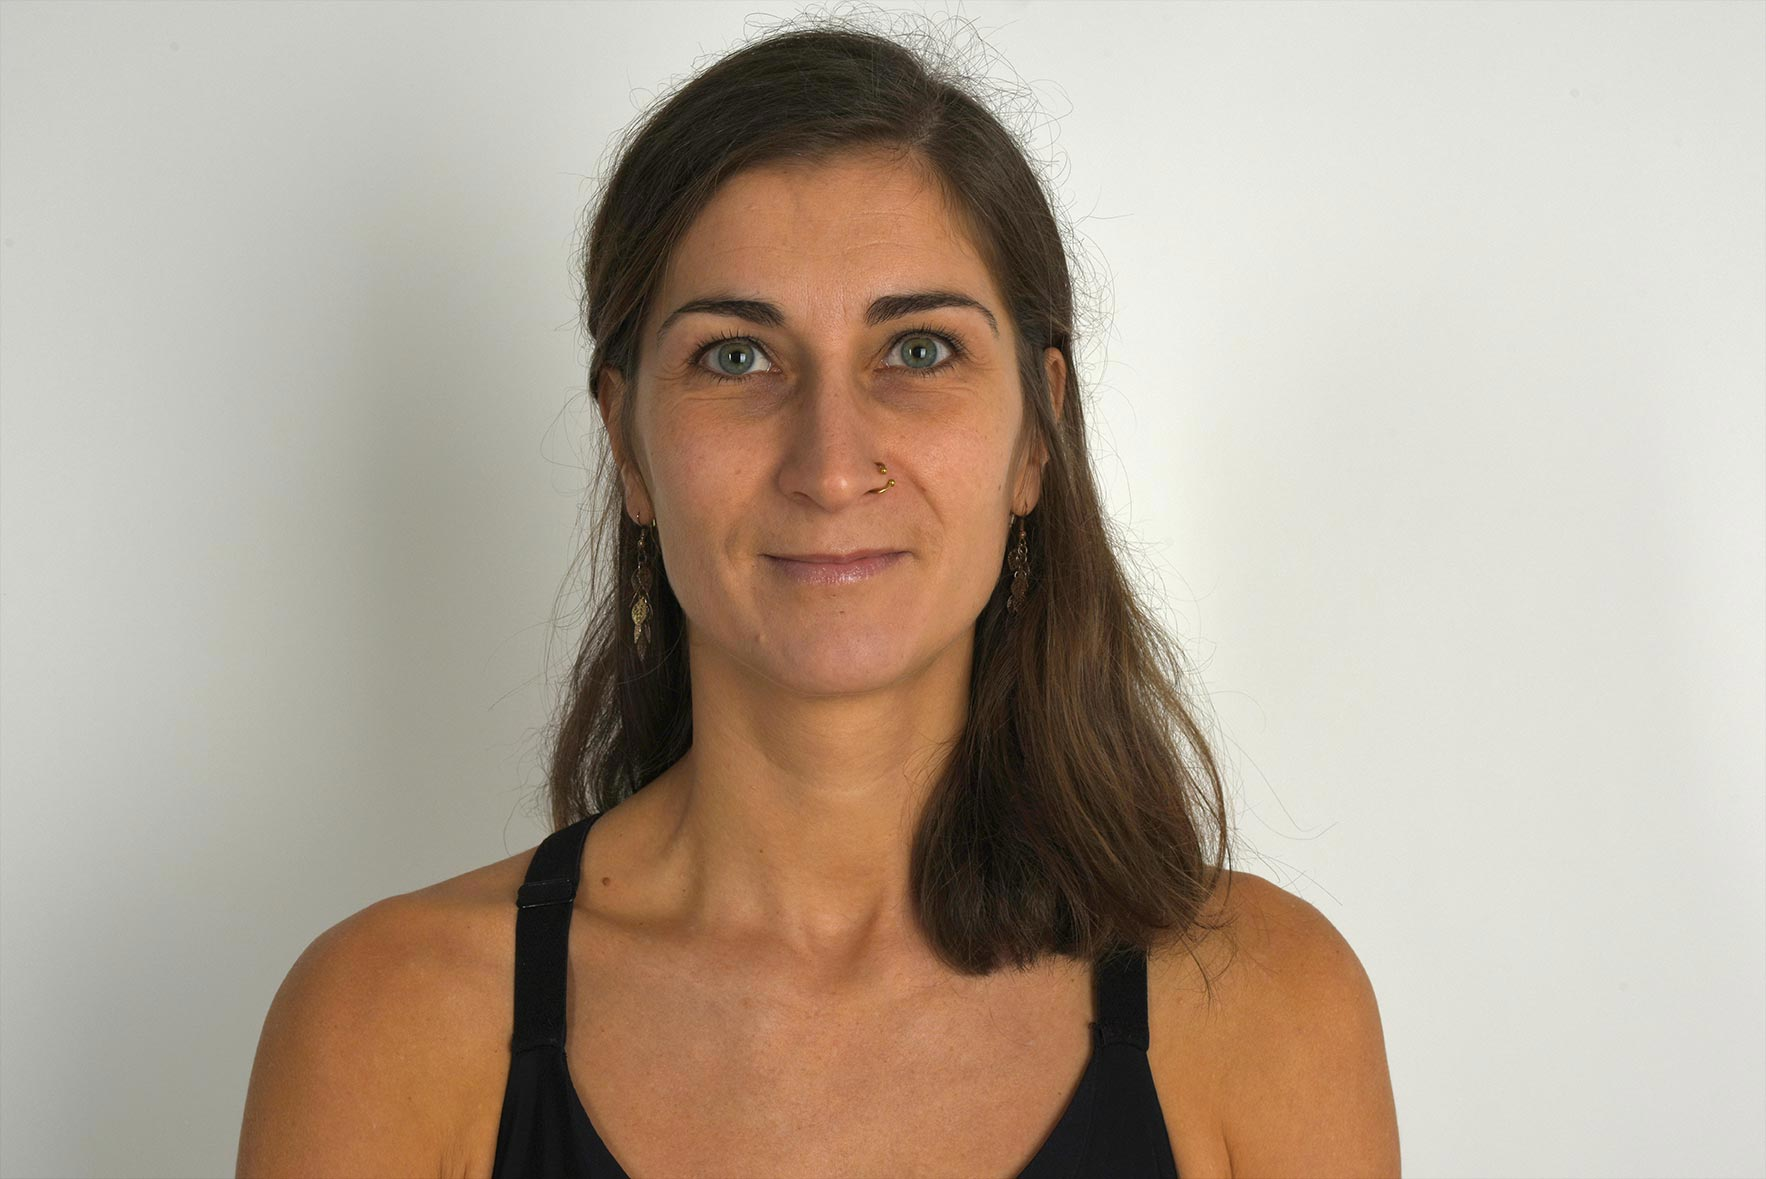 Johanna Staudinger